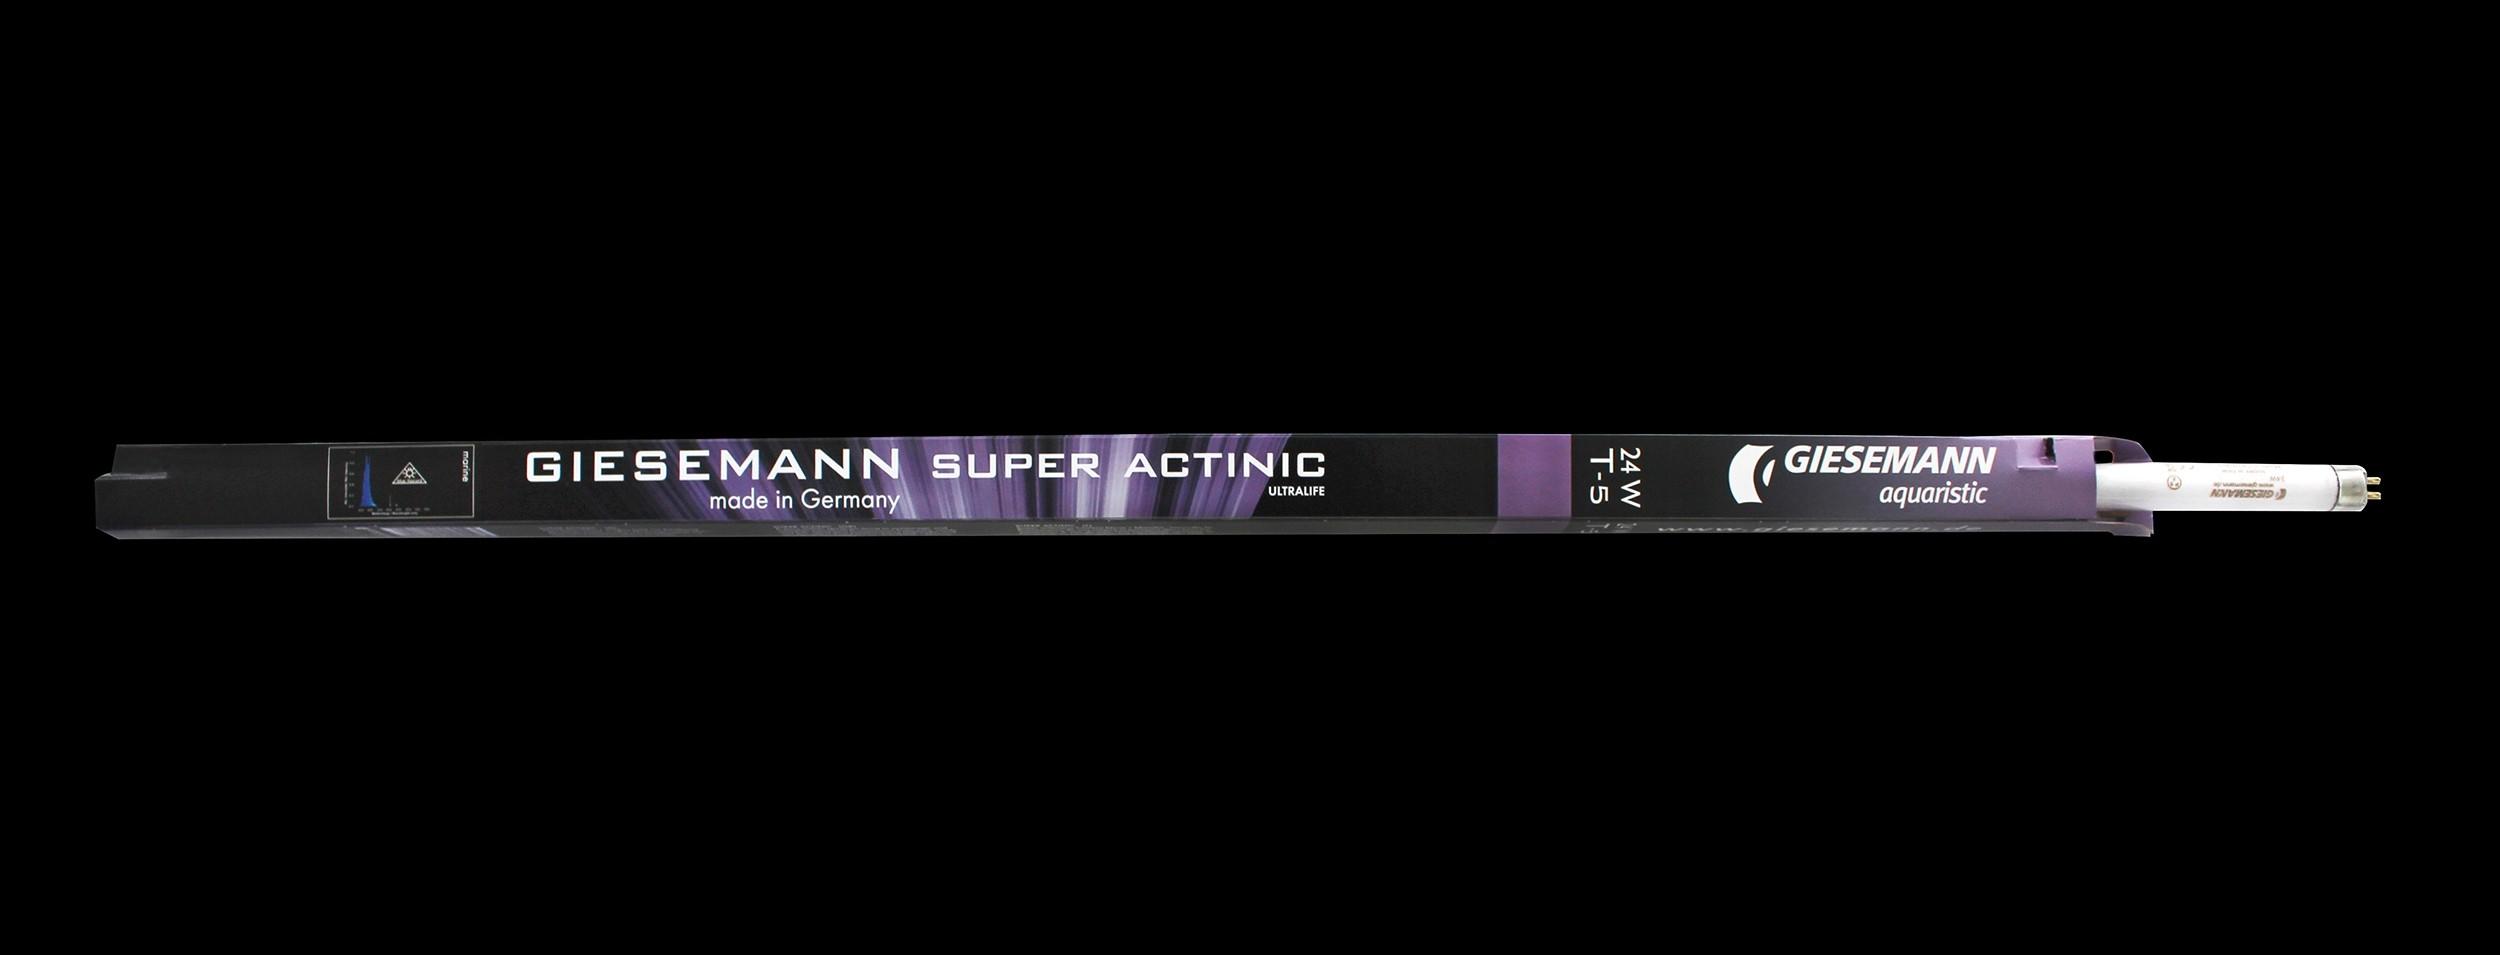 POWERCHROME T5 Super Actinic